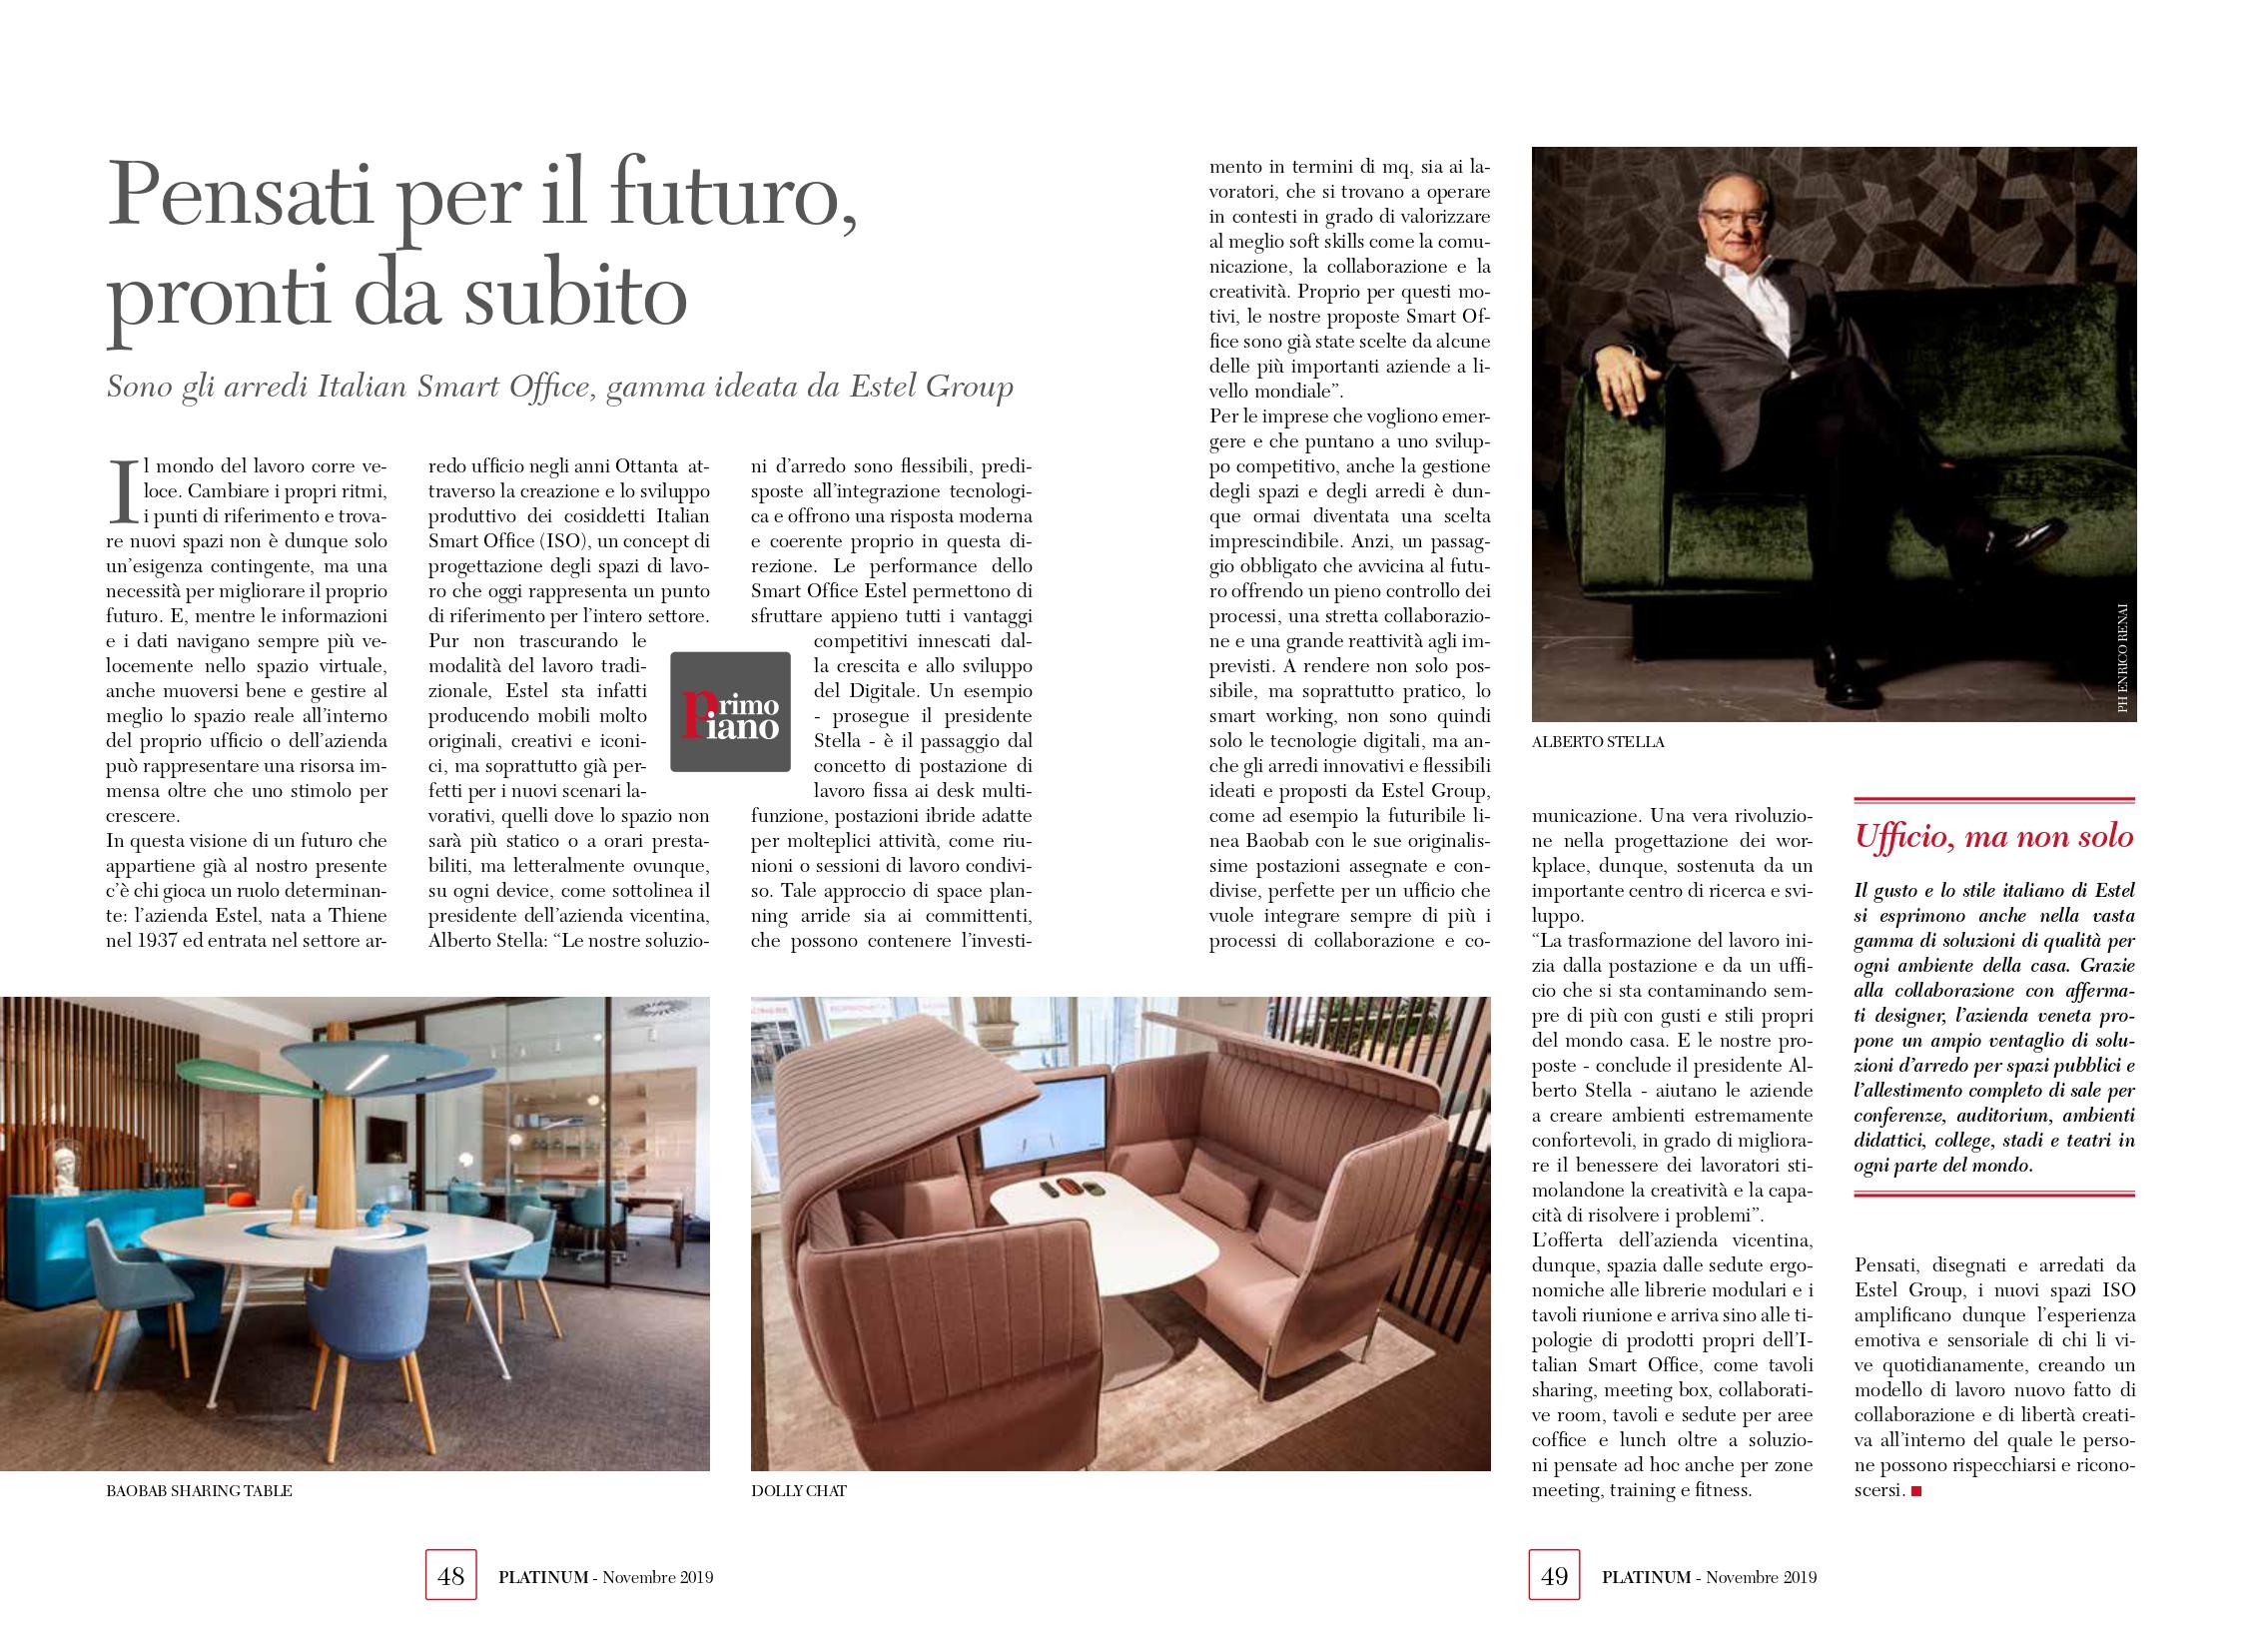 Alberto Stella su rivista Platinum